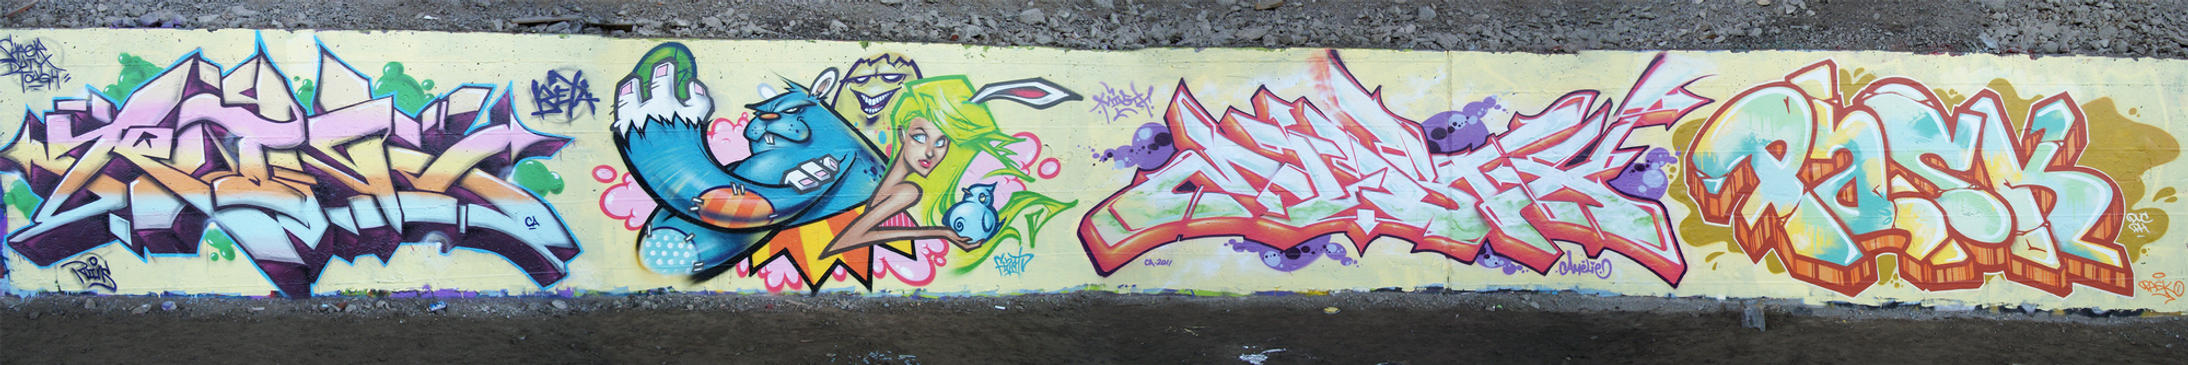 Easter Wall. by Fezat1